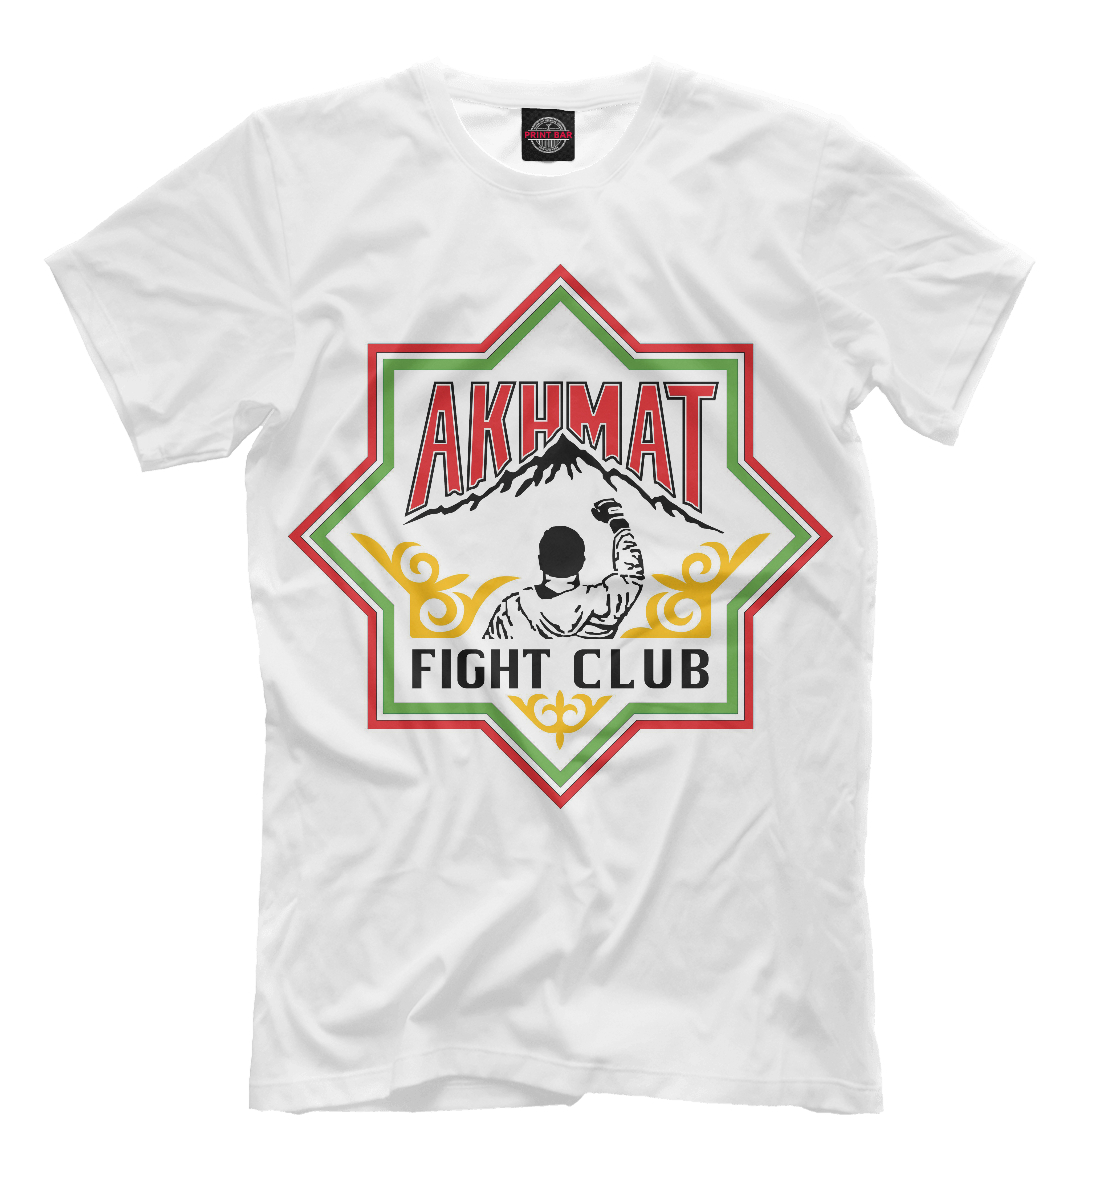 Купить Akhmat Fight Club, Printbar, Футболки, AFC-812098-fut-2